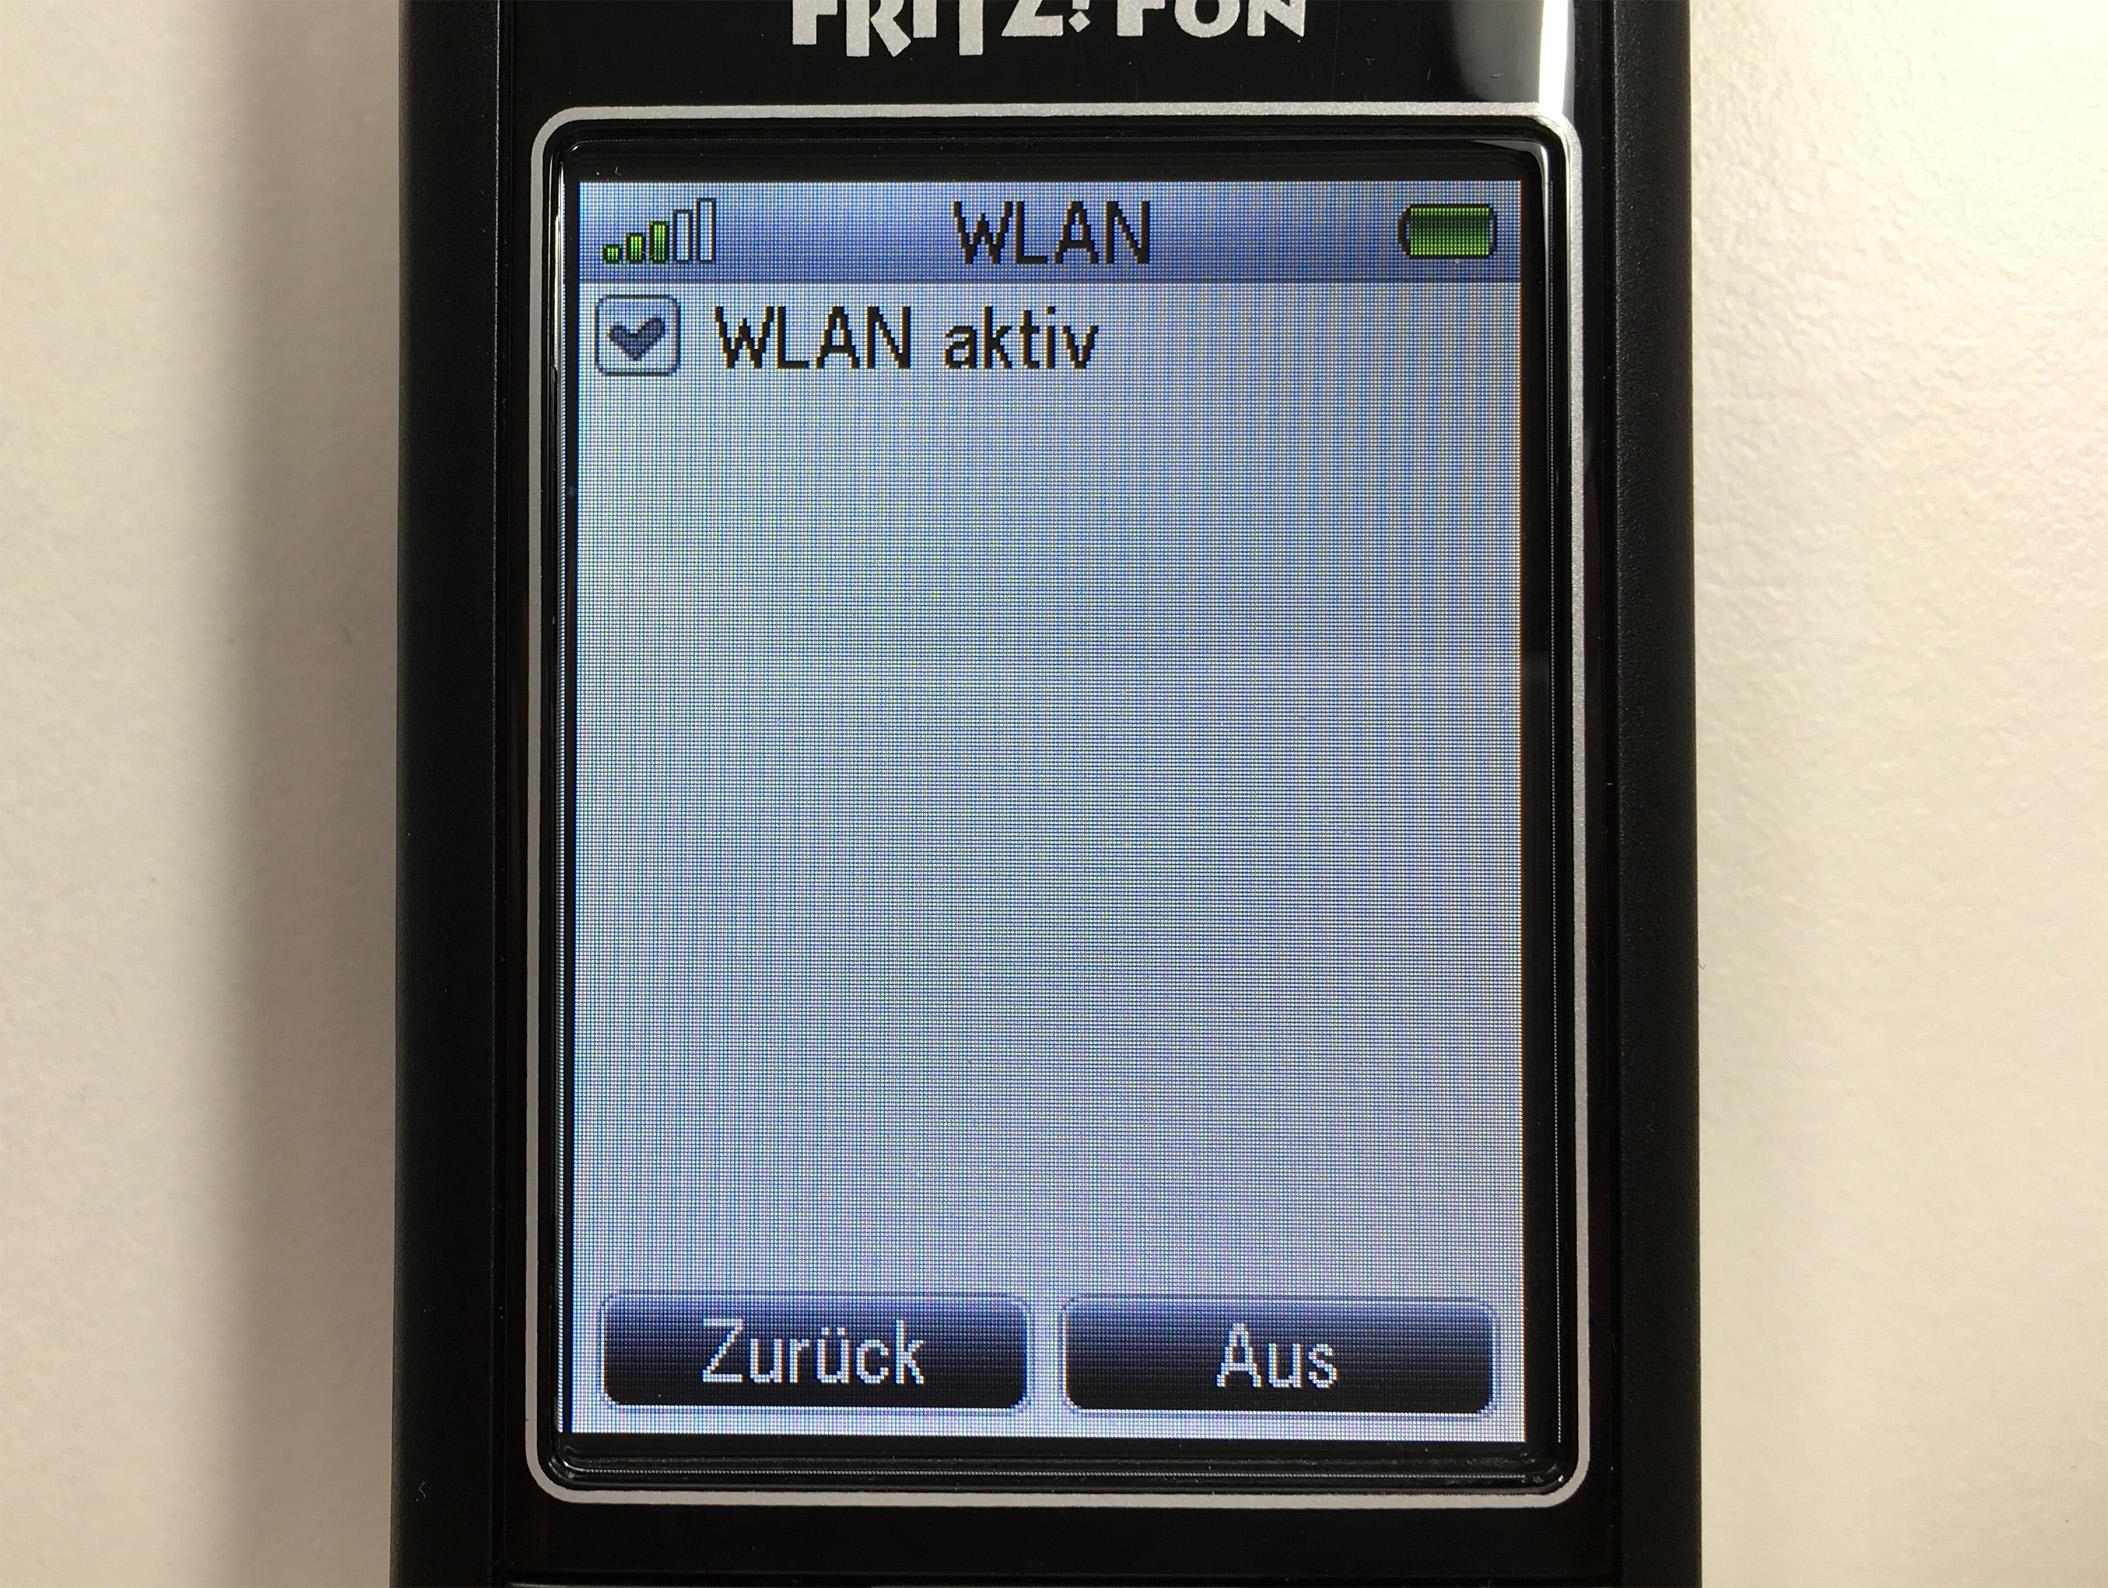 AVM FRITZ Fon C5 im Test was bietet das neueste FRITZ Fon Technikaffe